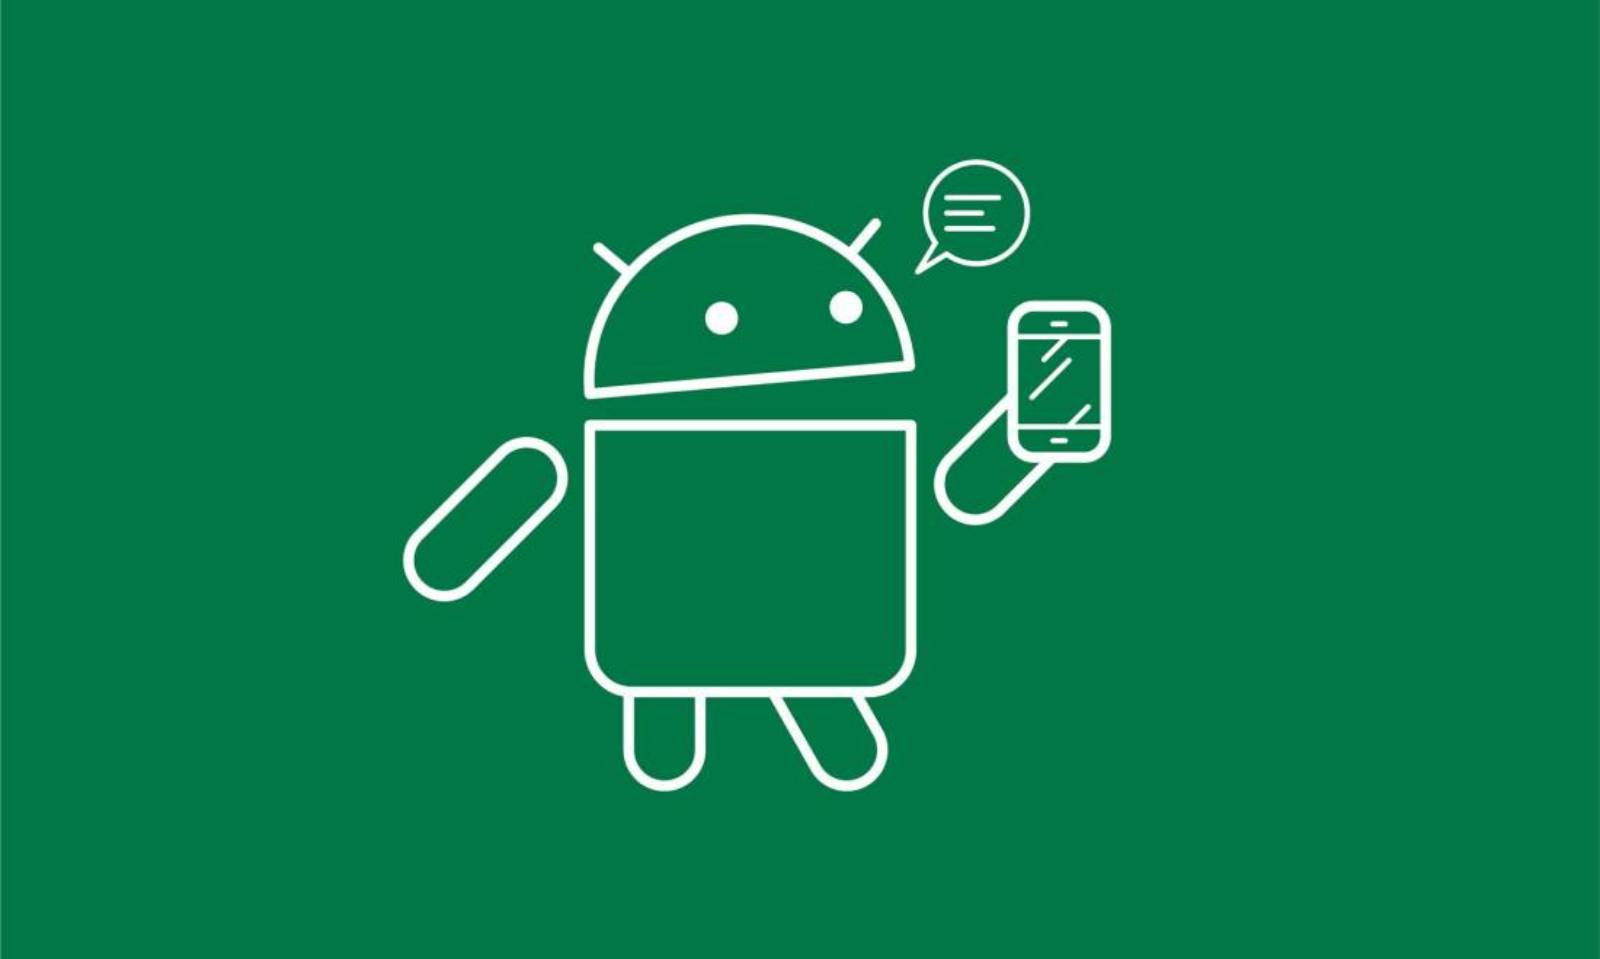 Telefoanele Huawei, Samsung, LG, Sony, IN PERICOL din cauza unui nou HACK